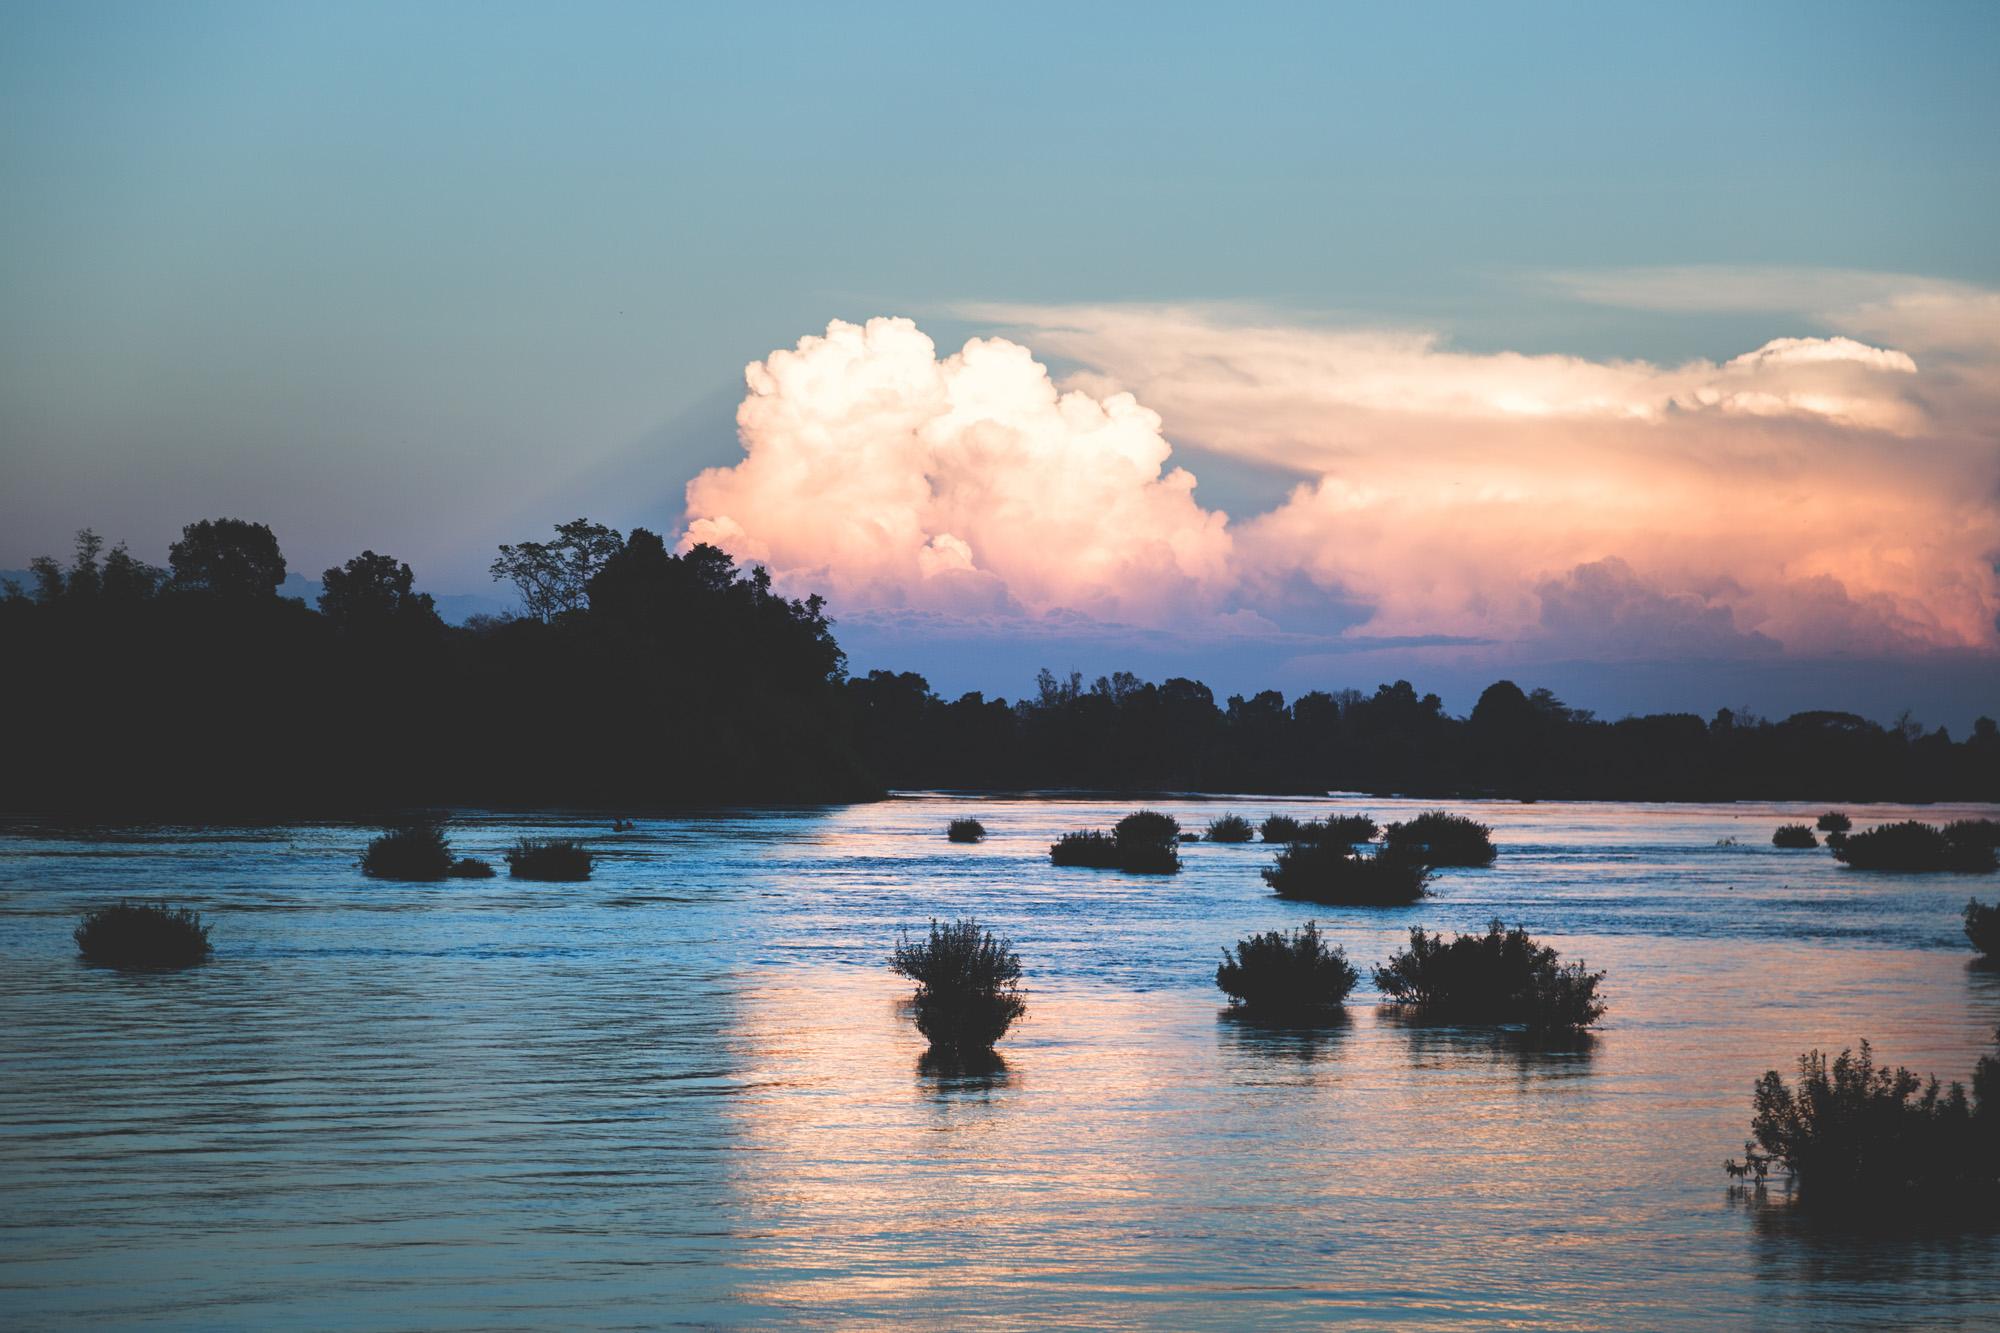 Laos 1000 Islands